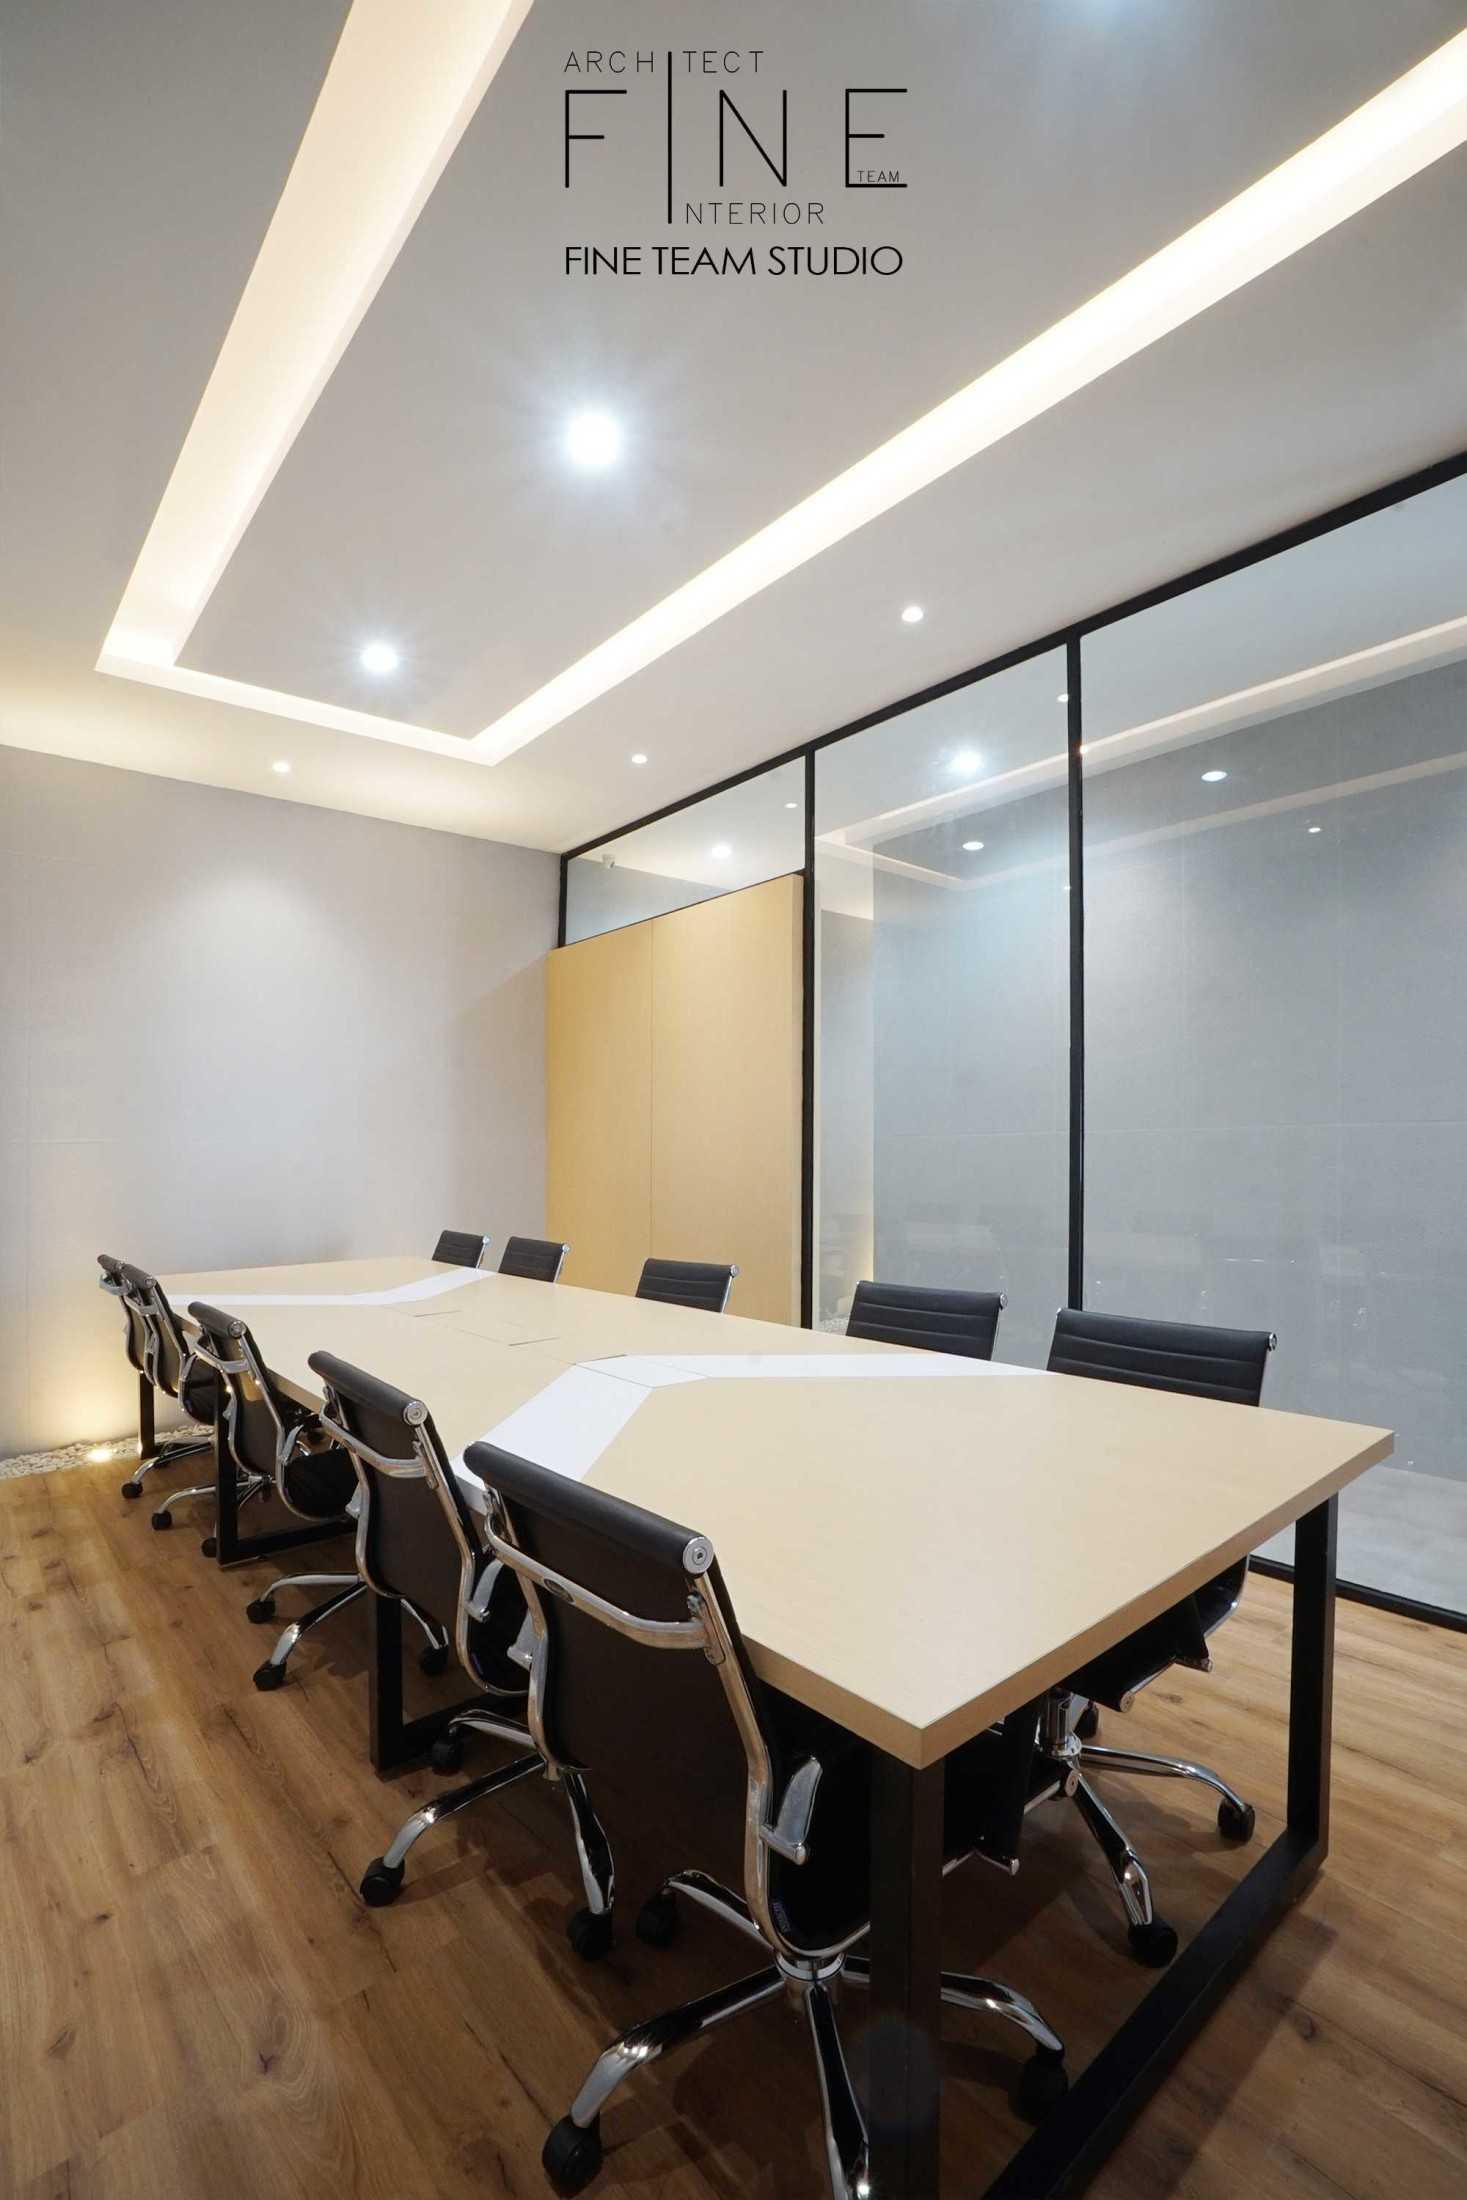 Fine Team Studio Mob Office Cikupa, Tangerang, Banten, Indonesia Cikupa, Tangerang, Banten, Indonesia Fine-Team-Studio-Mob-Office  71146